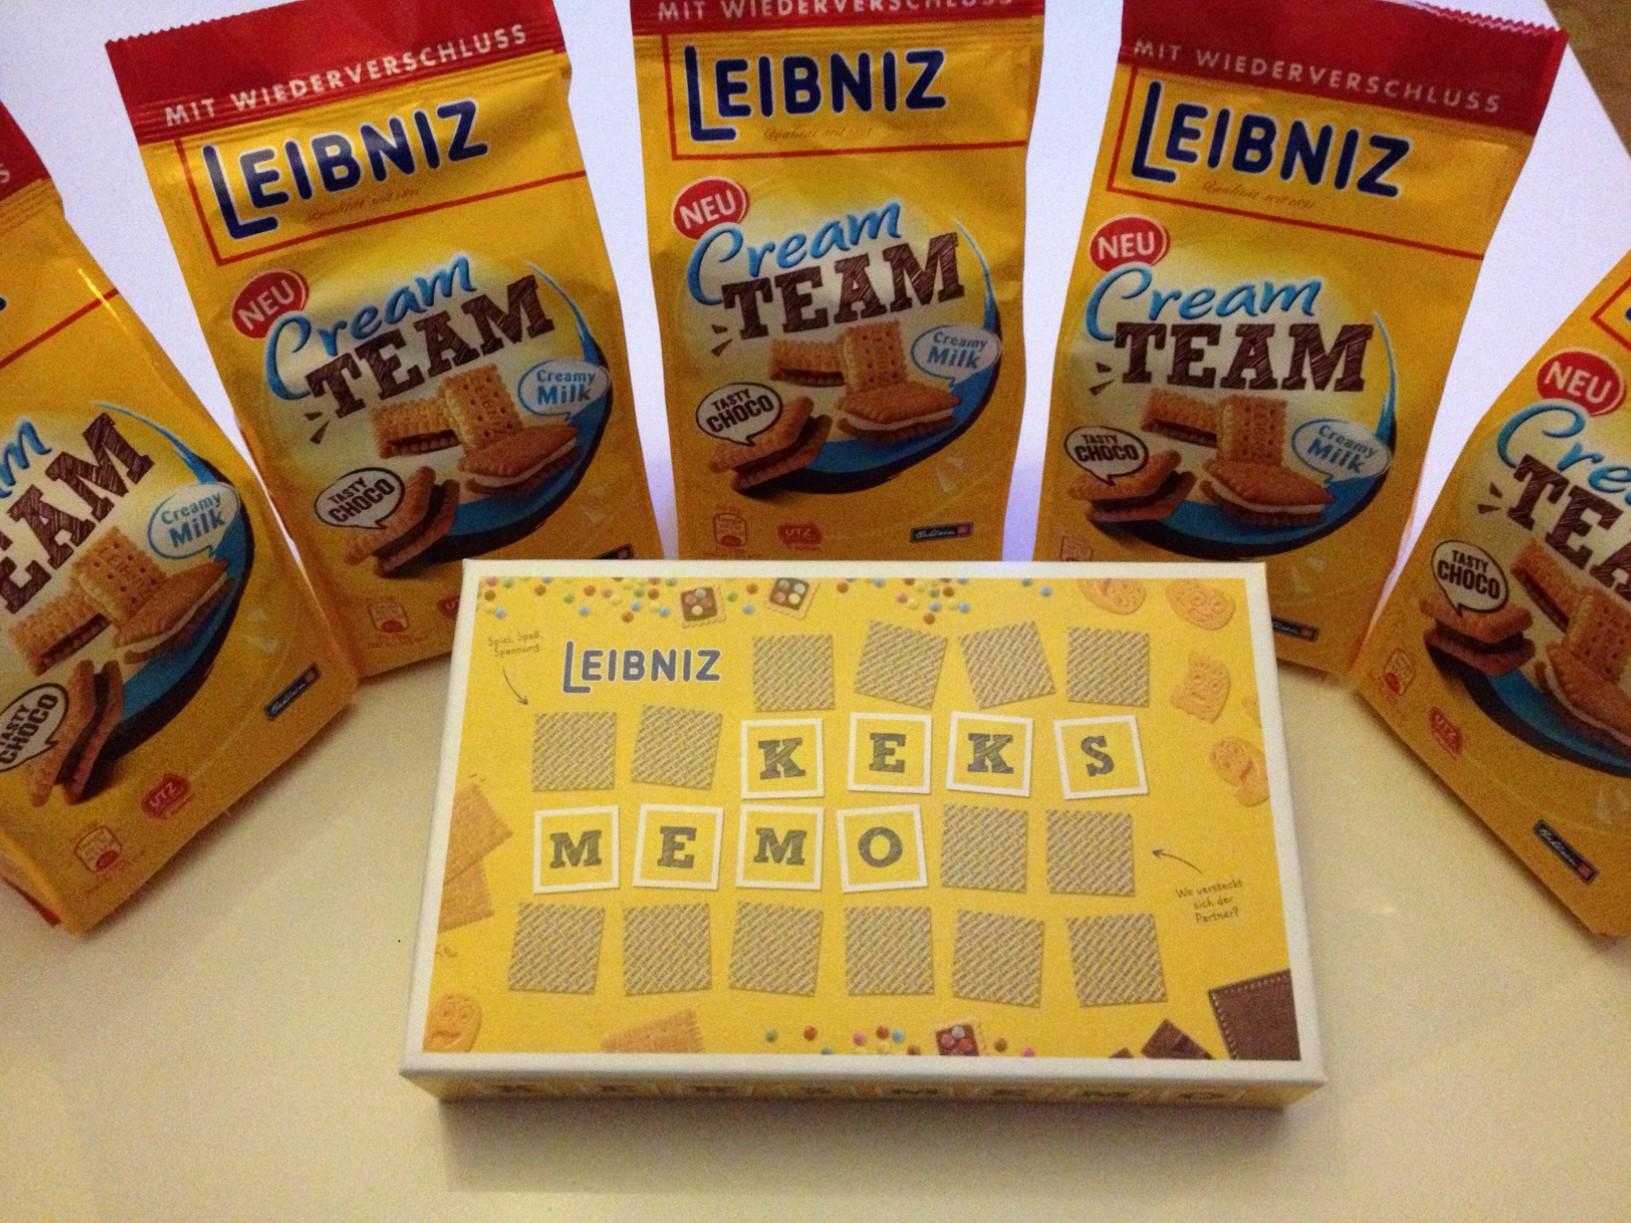 Leibniz Gewinnspiel